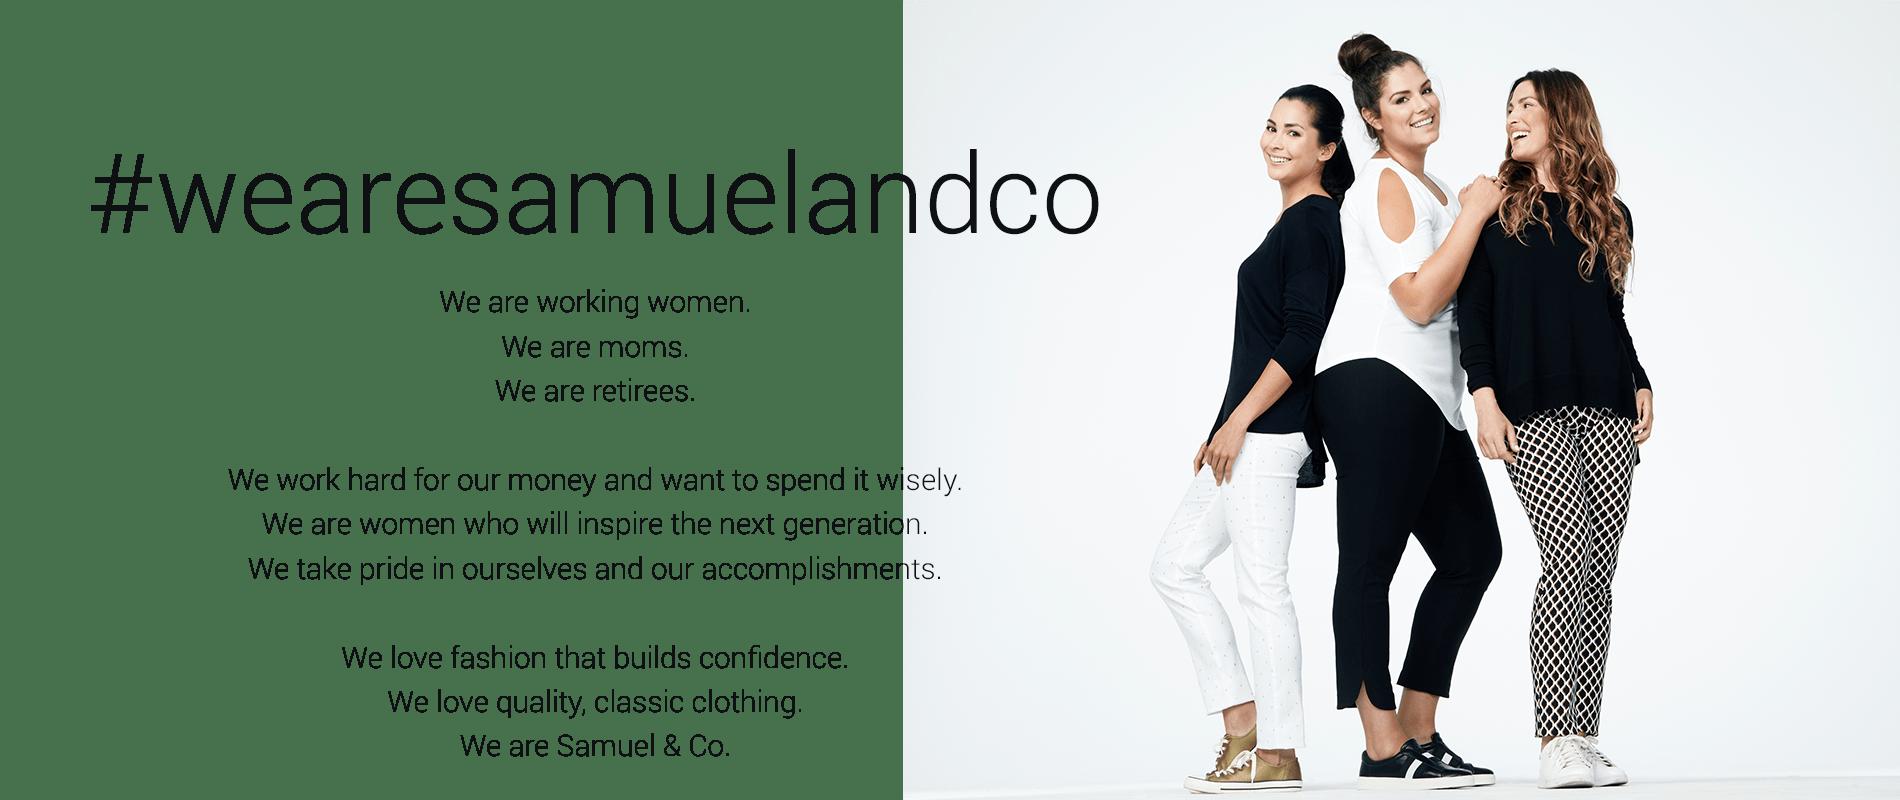 b628ef81a784 wearesamuelandco women s clothing in atlantic canada - Samuelandco